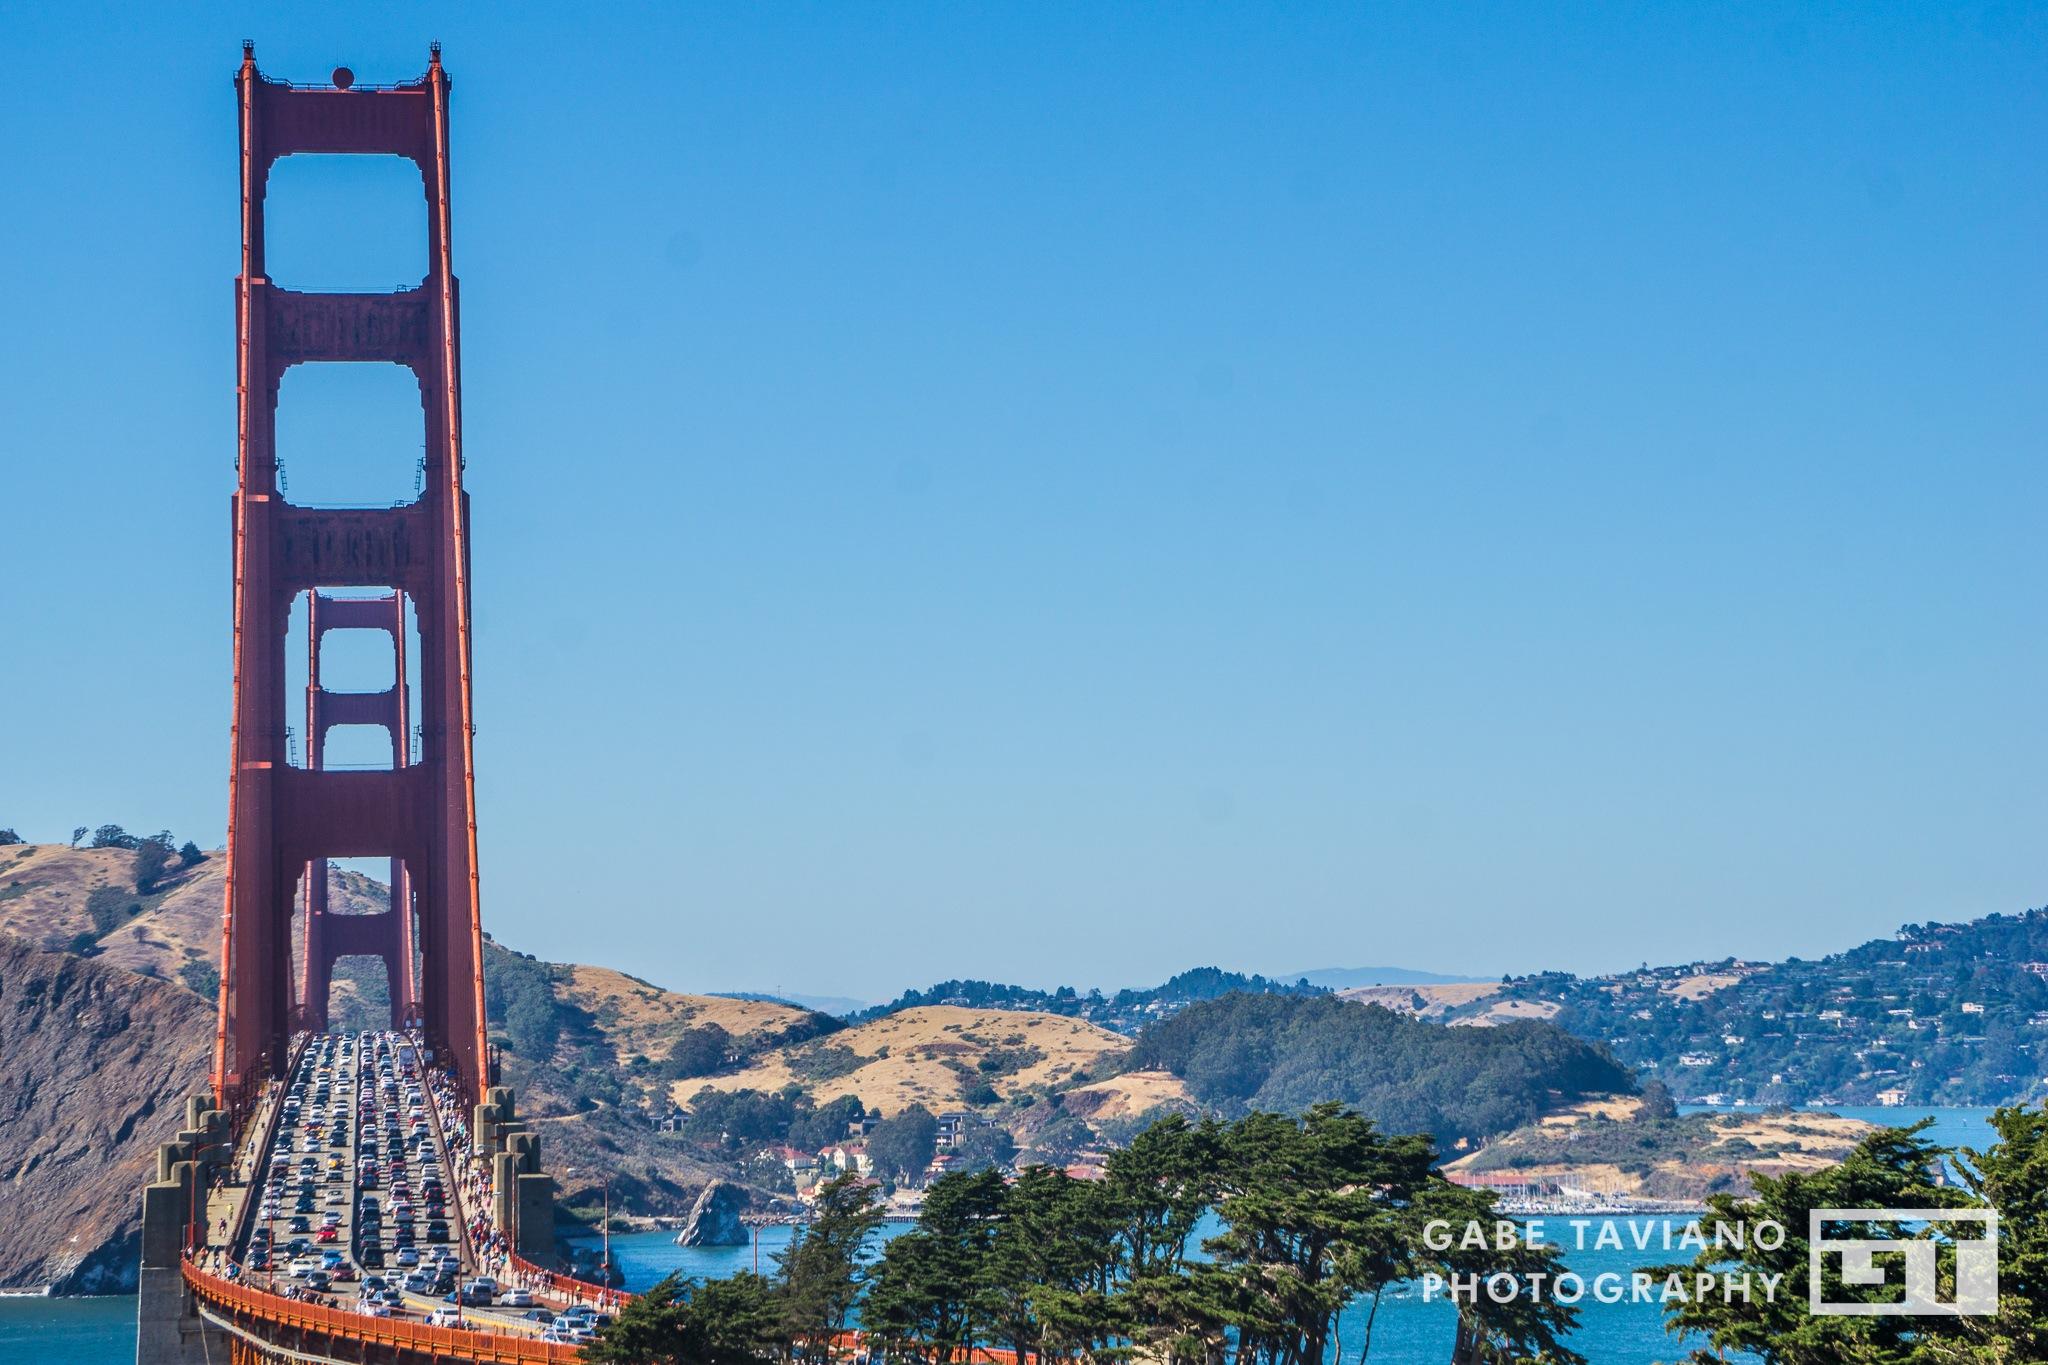 Traffic on the Golden Gate Bridge by Gabe Taviano